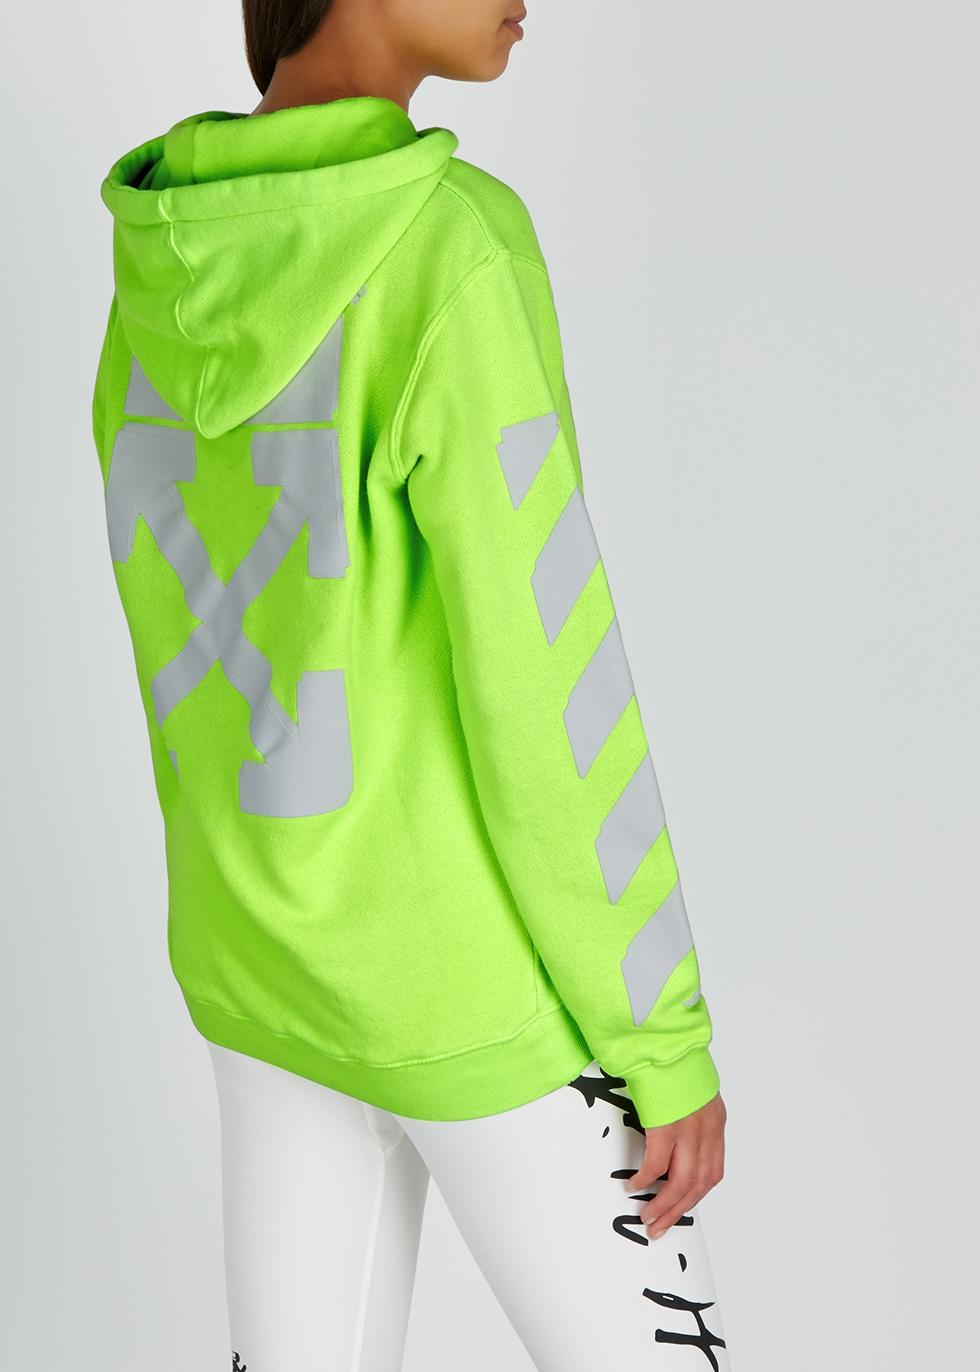 Neon green hooded cotton sweatshirt - Off-White